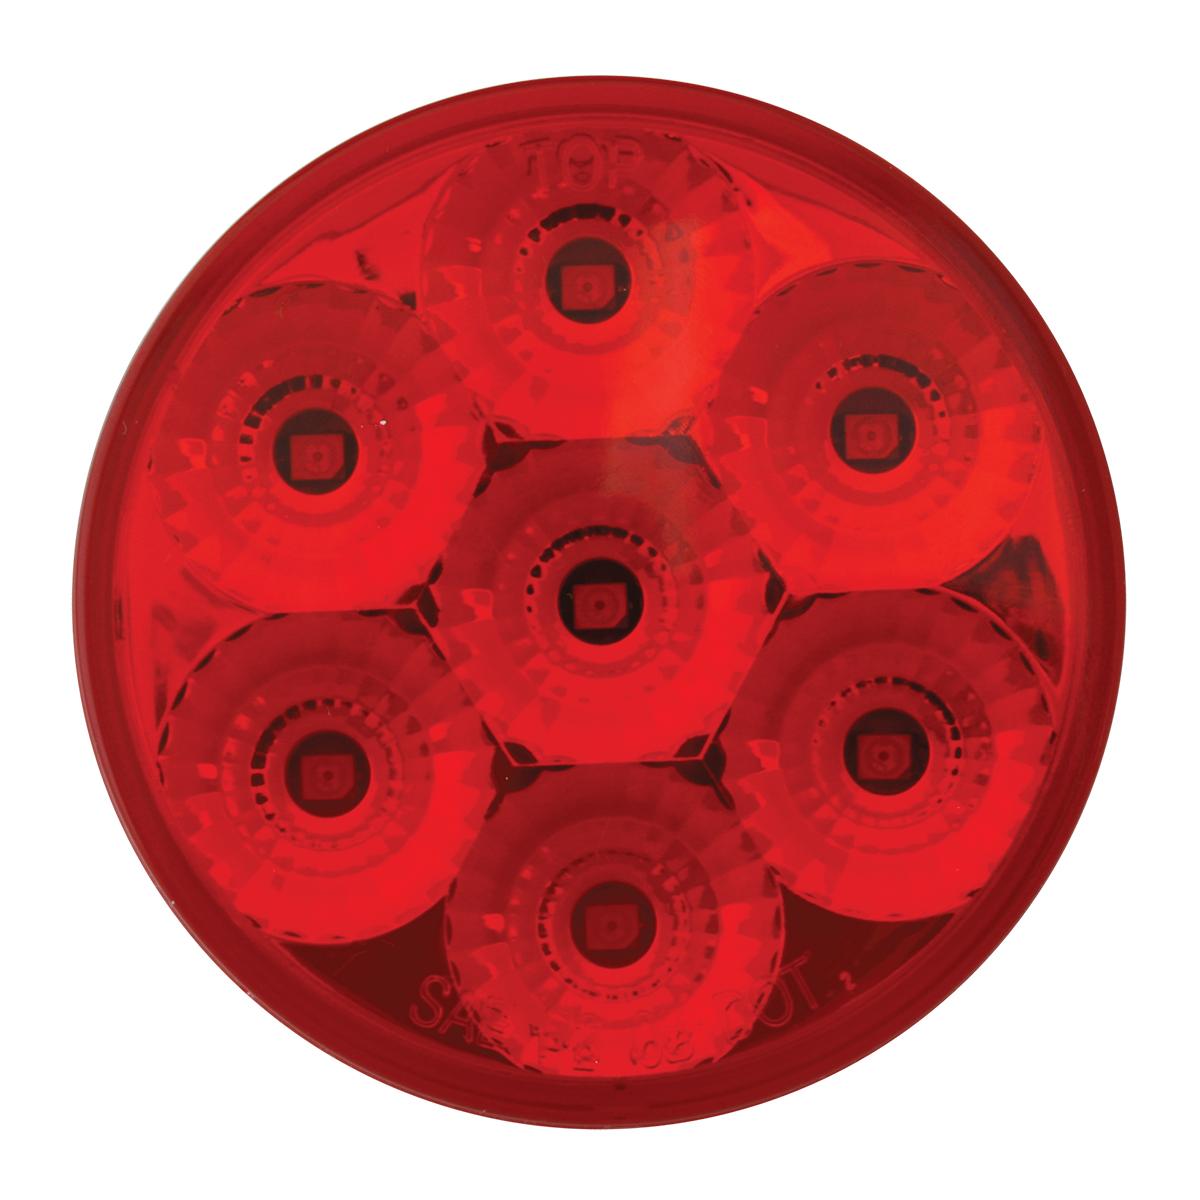 "76667 2-1/2"" Dual Function Spyder LED Light"